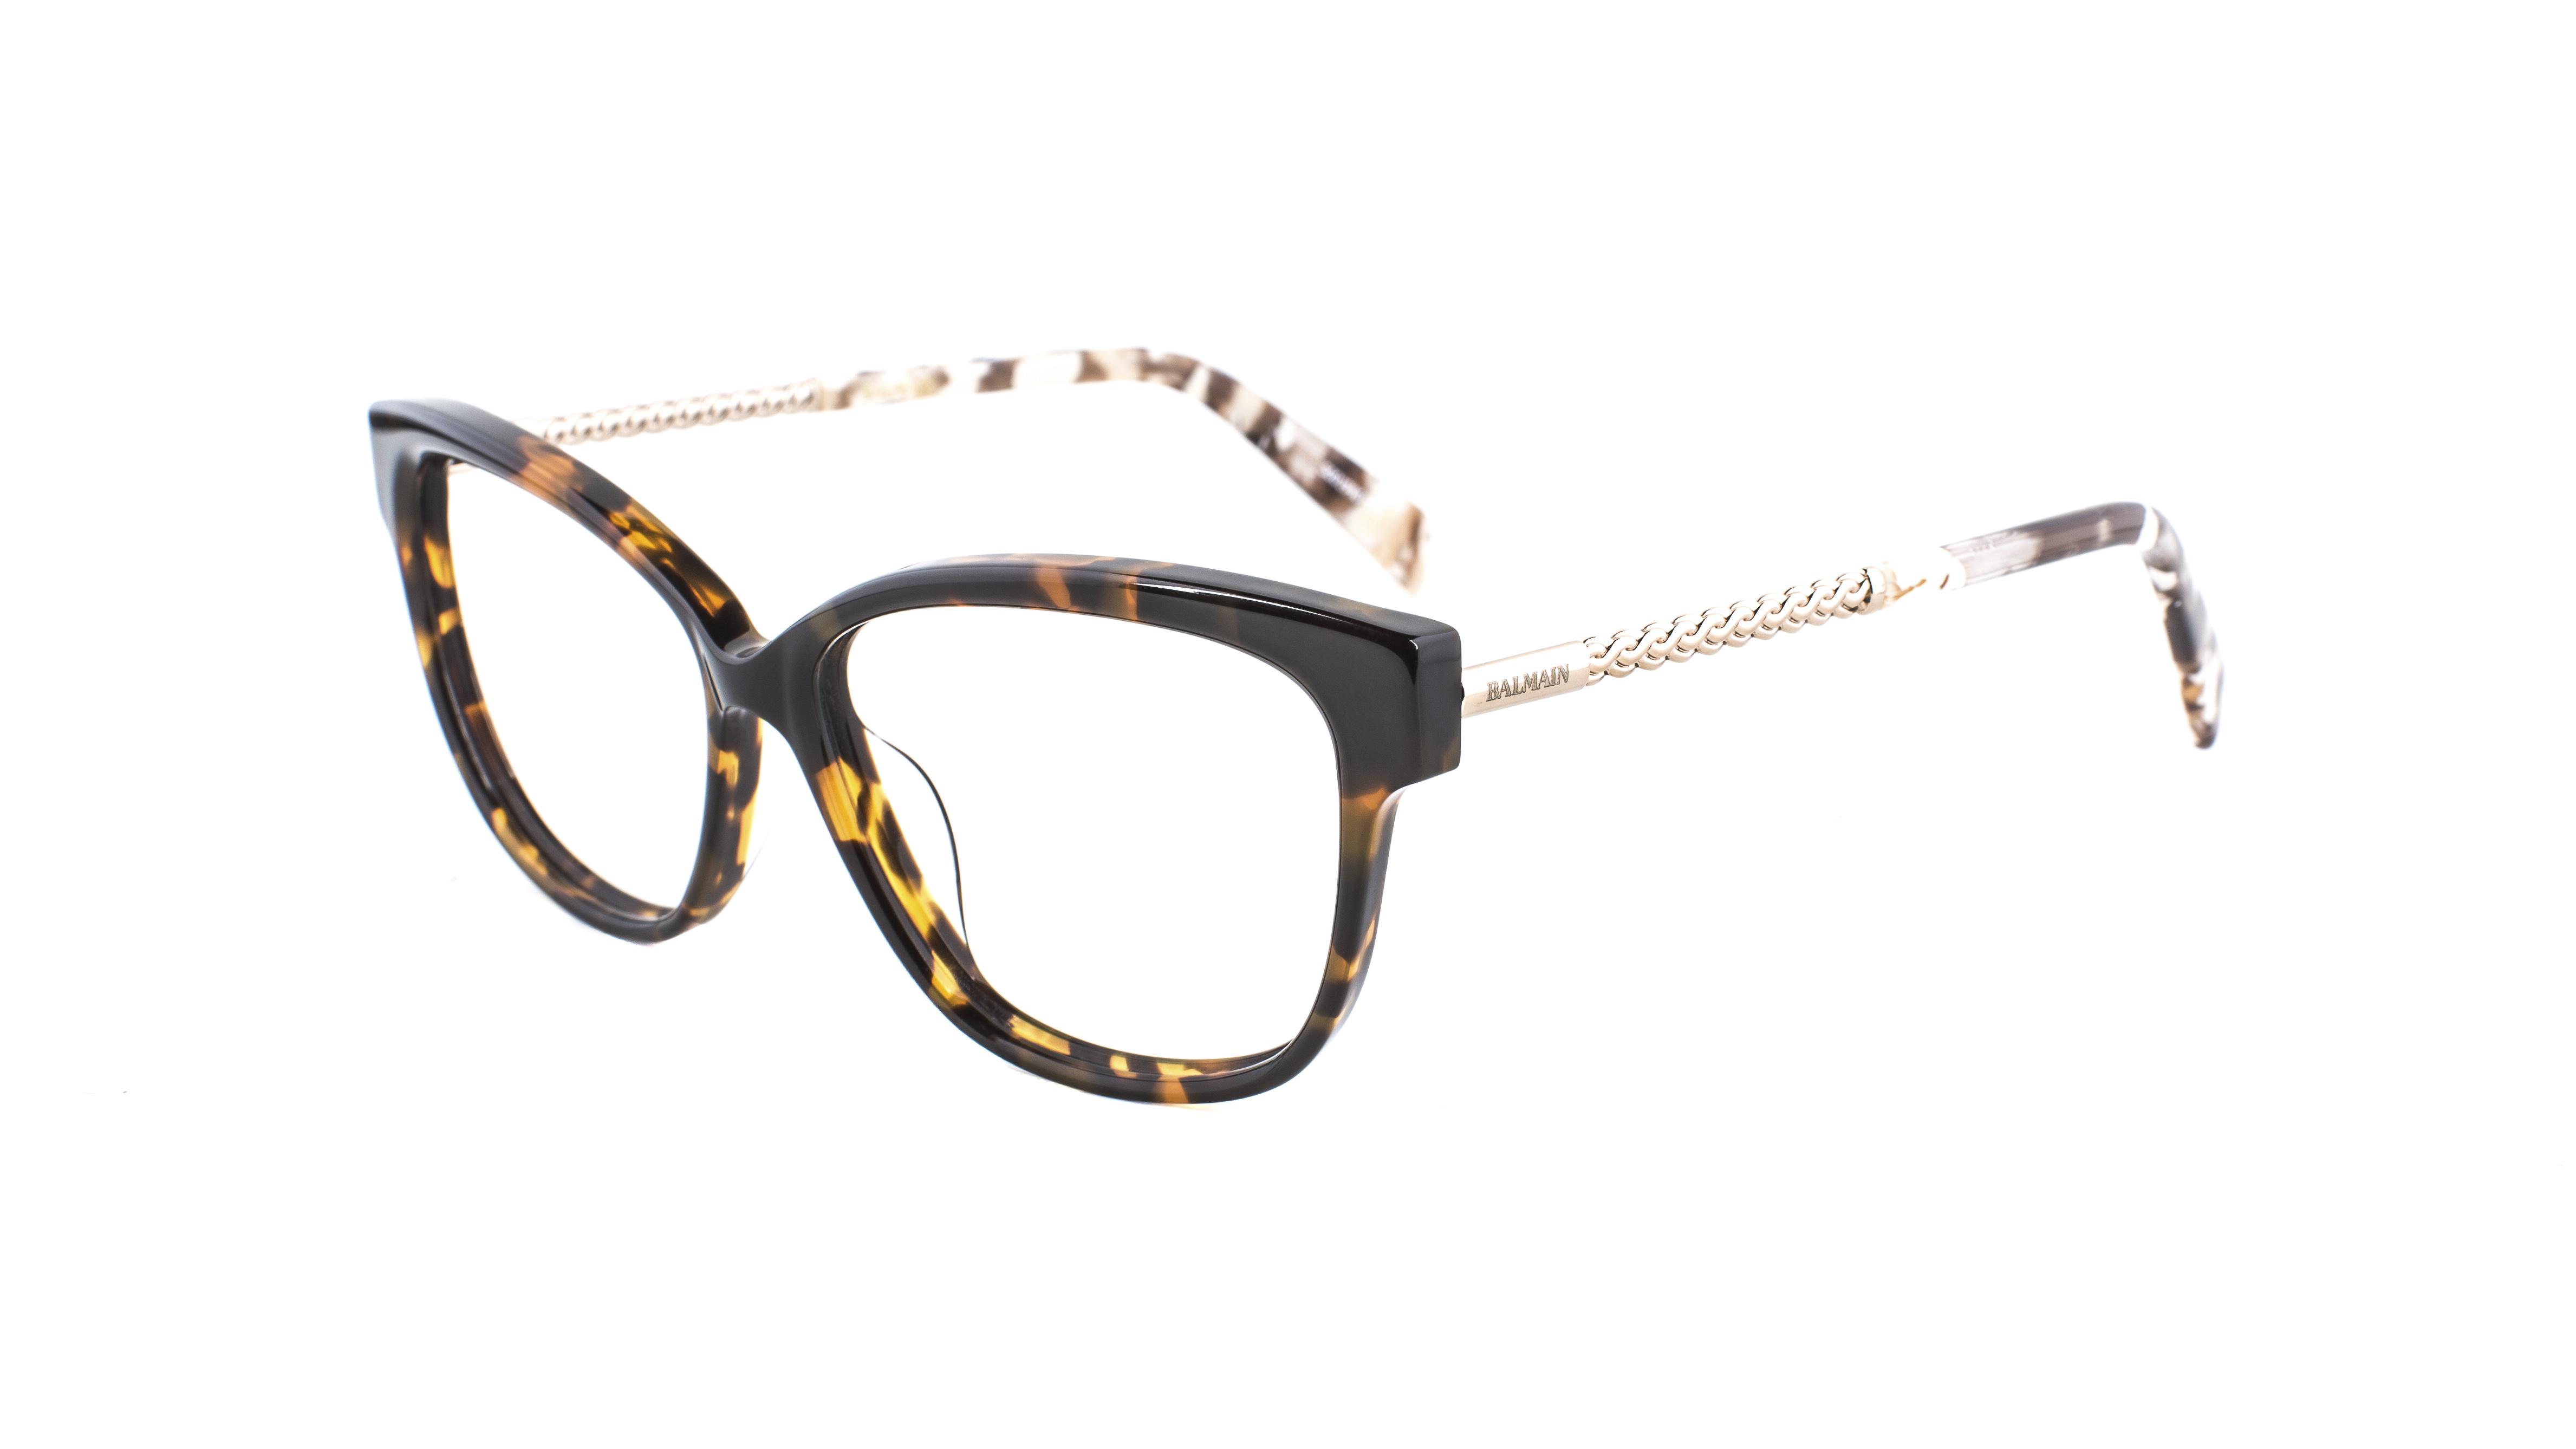 Balmain x Specsavers BL1513S 30570726 - RRP 2 pairs single vision $349